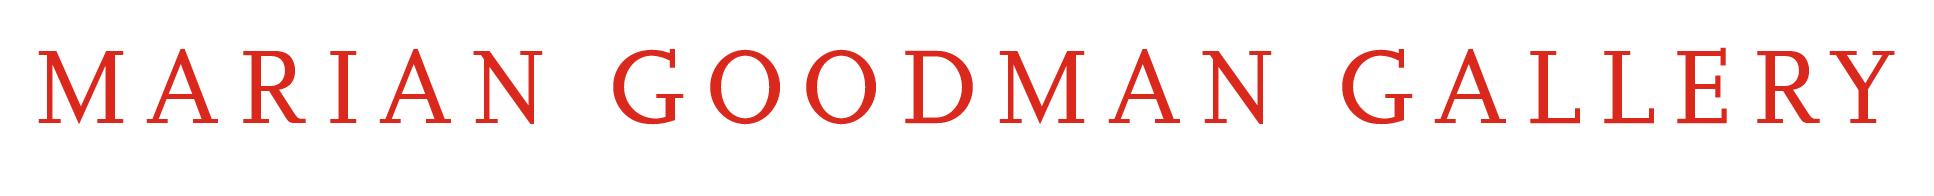 MGG新闻|悼念克里斯蒂安 · 波尔坦斯基 克里斯蒂安 波尔坦斯基 MGG 新闻 Didier Plowy 艺术 道路 伙伴 挚友 崇真艺客